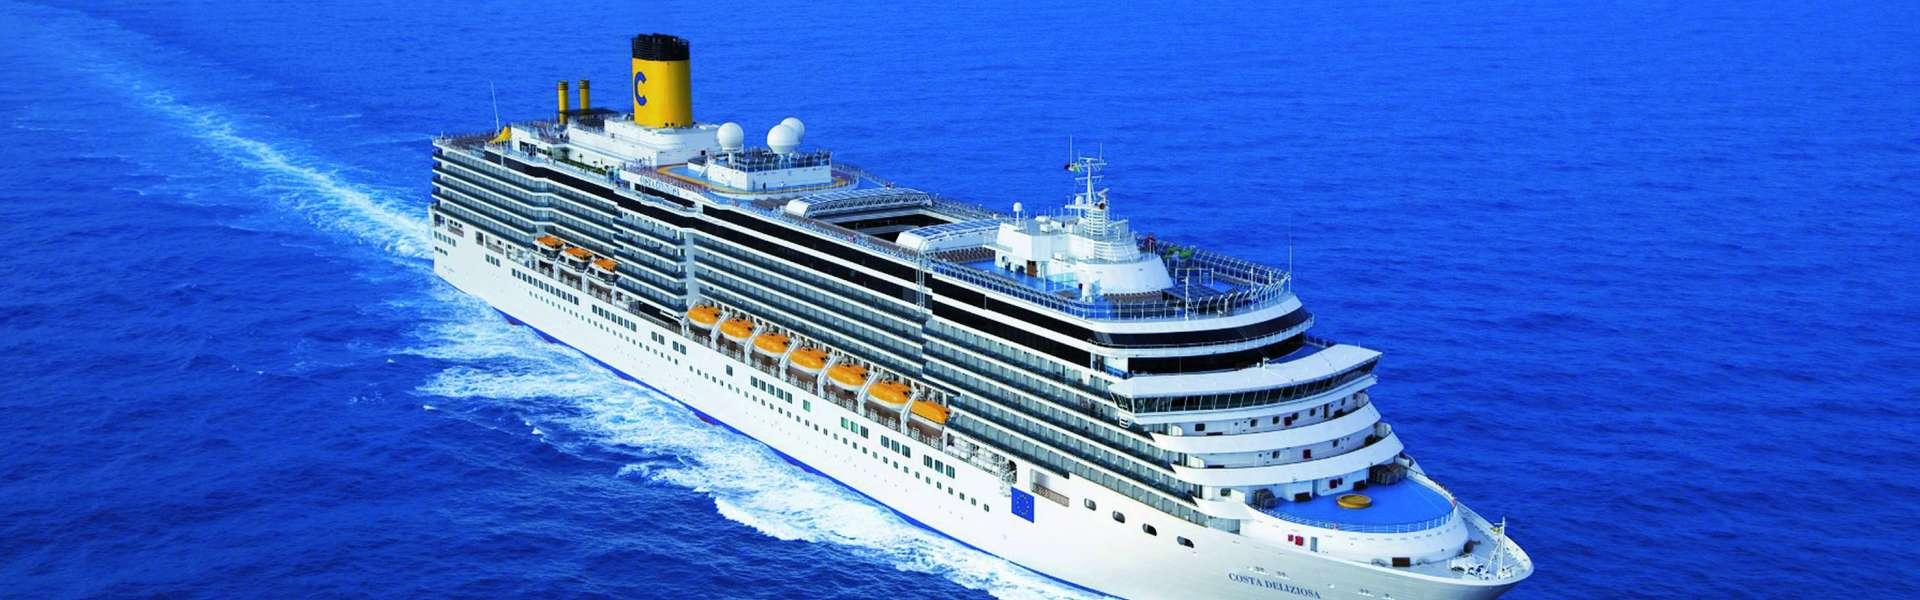 Croaziera 2019 - Caraibele de Vest (Port Everglades) - Costa Cruises - Costa Deliziosa - 10 nopti